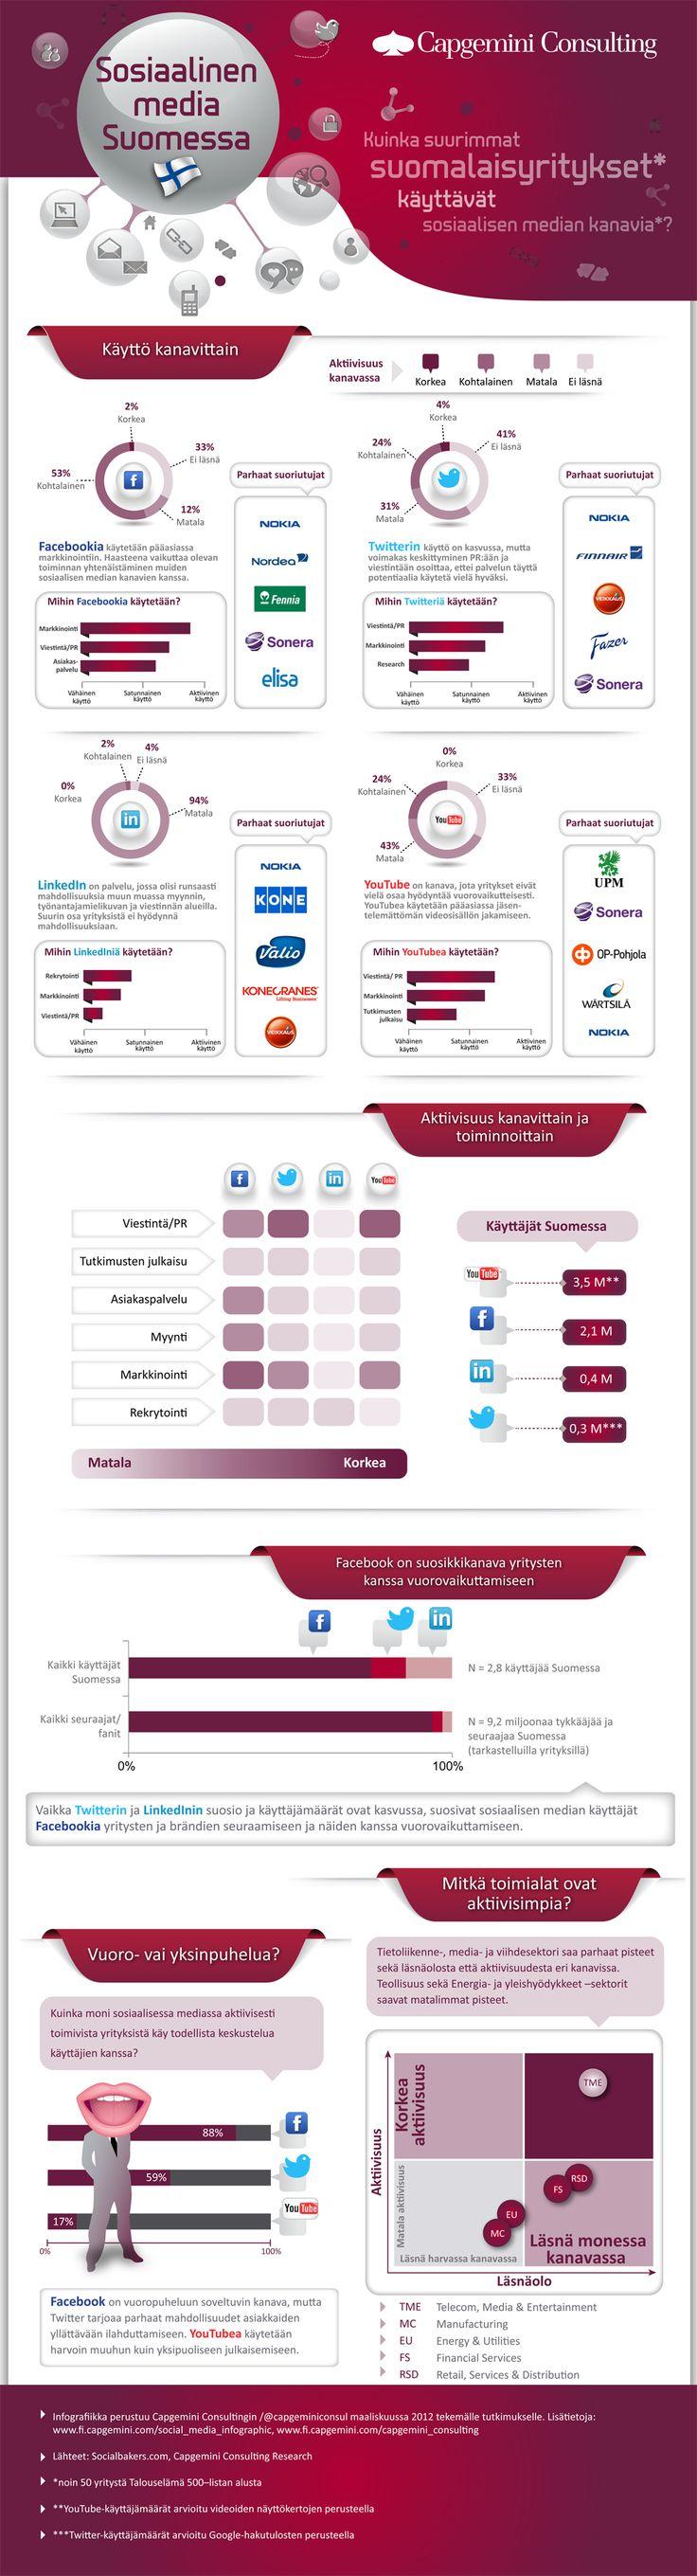 #Finnish companies in #socialmedia (Q2/2012)